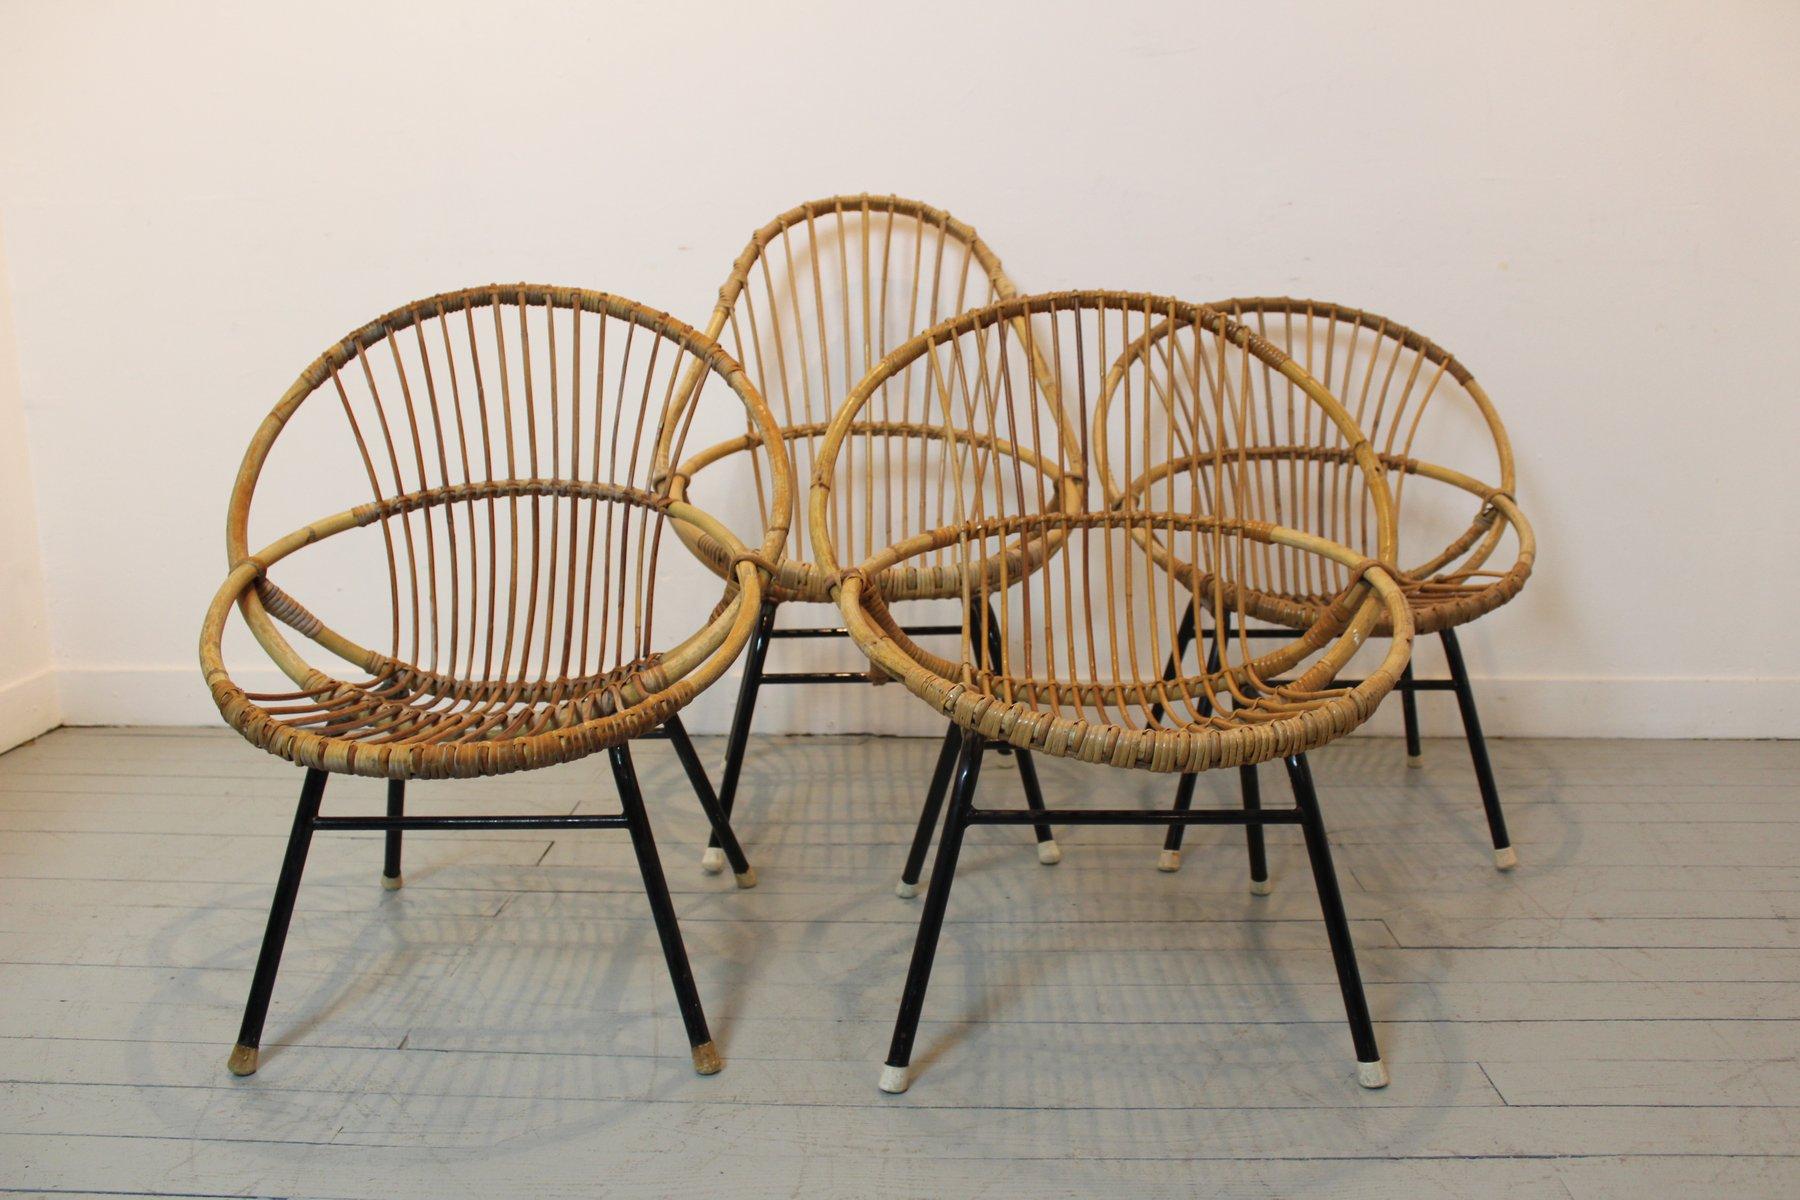 franz sische vintage bambus rattan st hle 4er set bei pamono kaufen. Black Bedroom Furniture Sets. Home Design Ideas